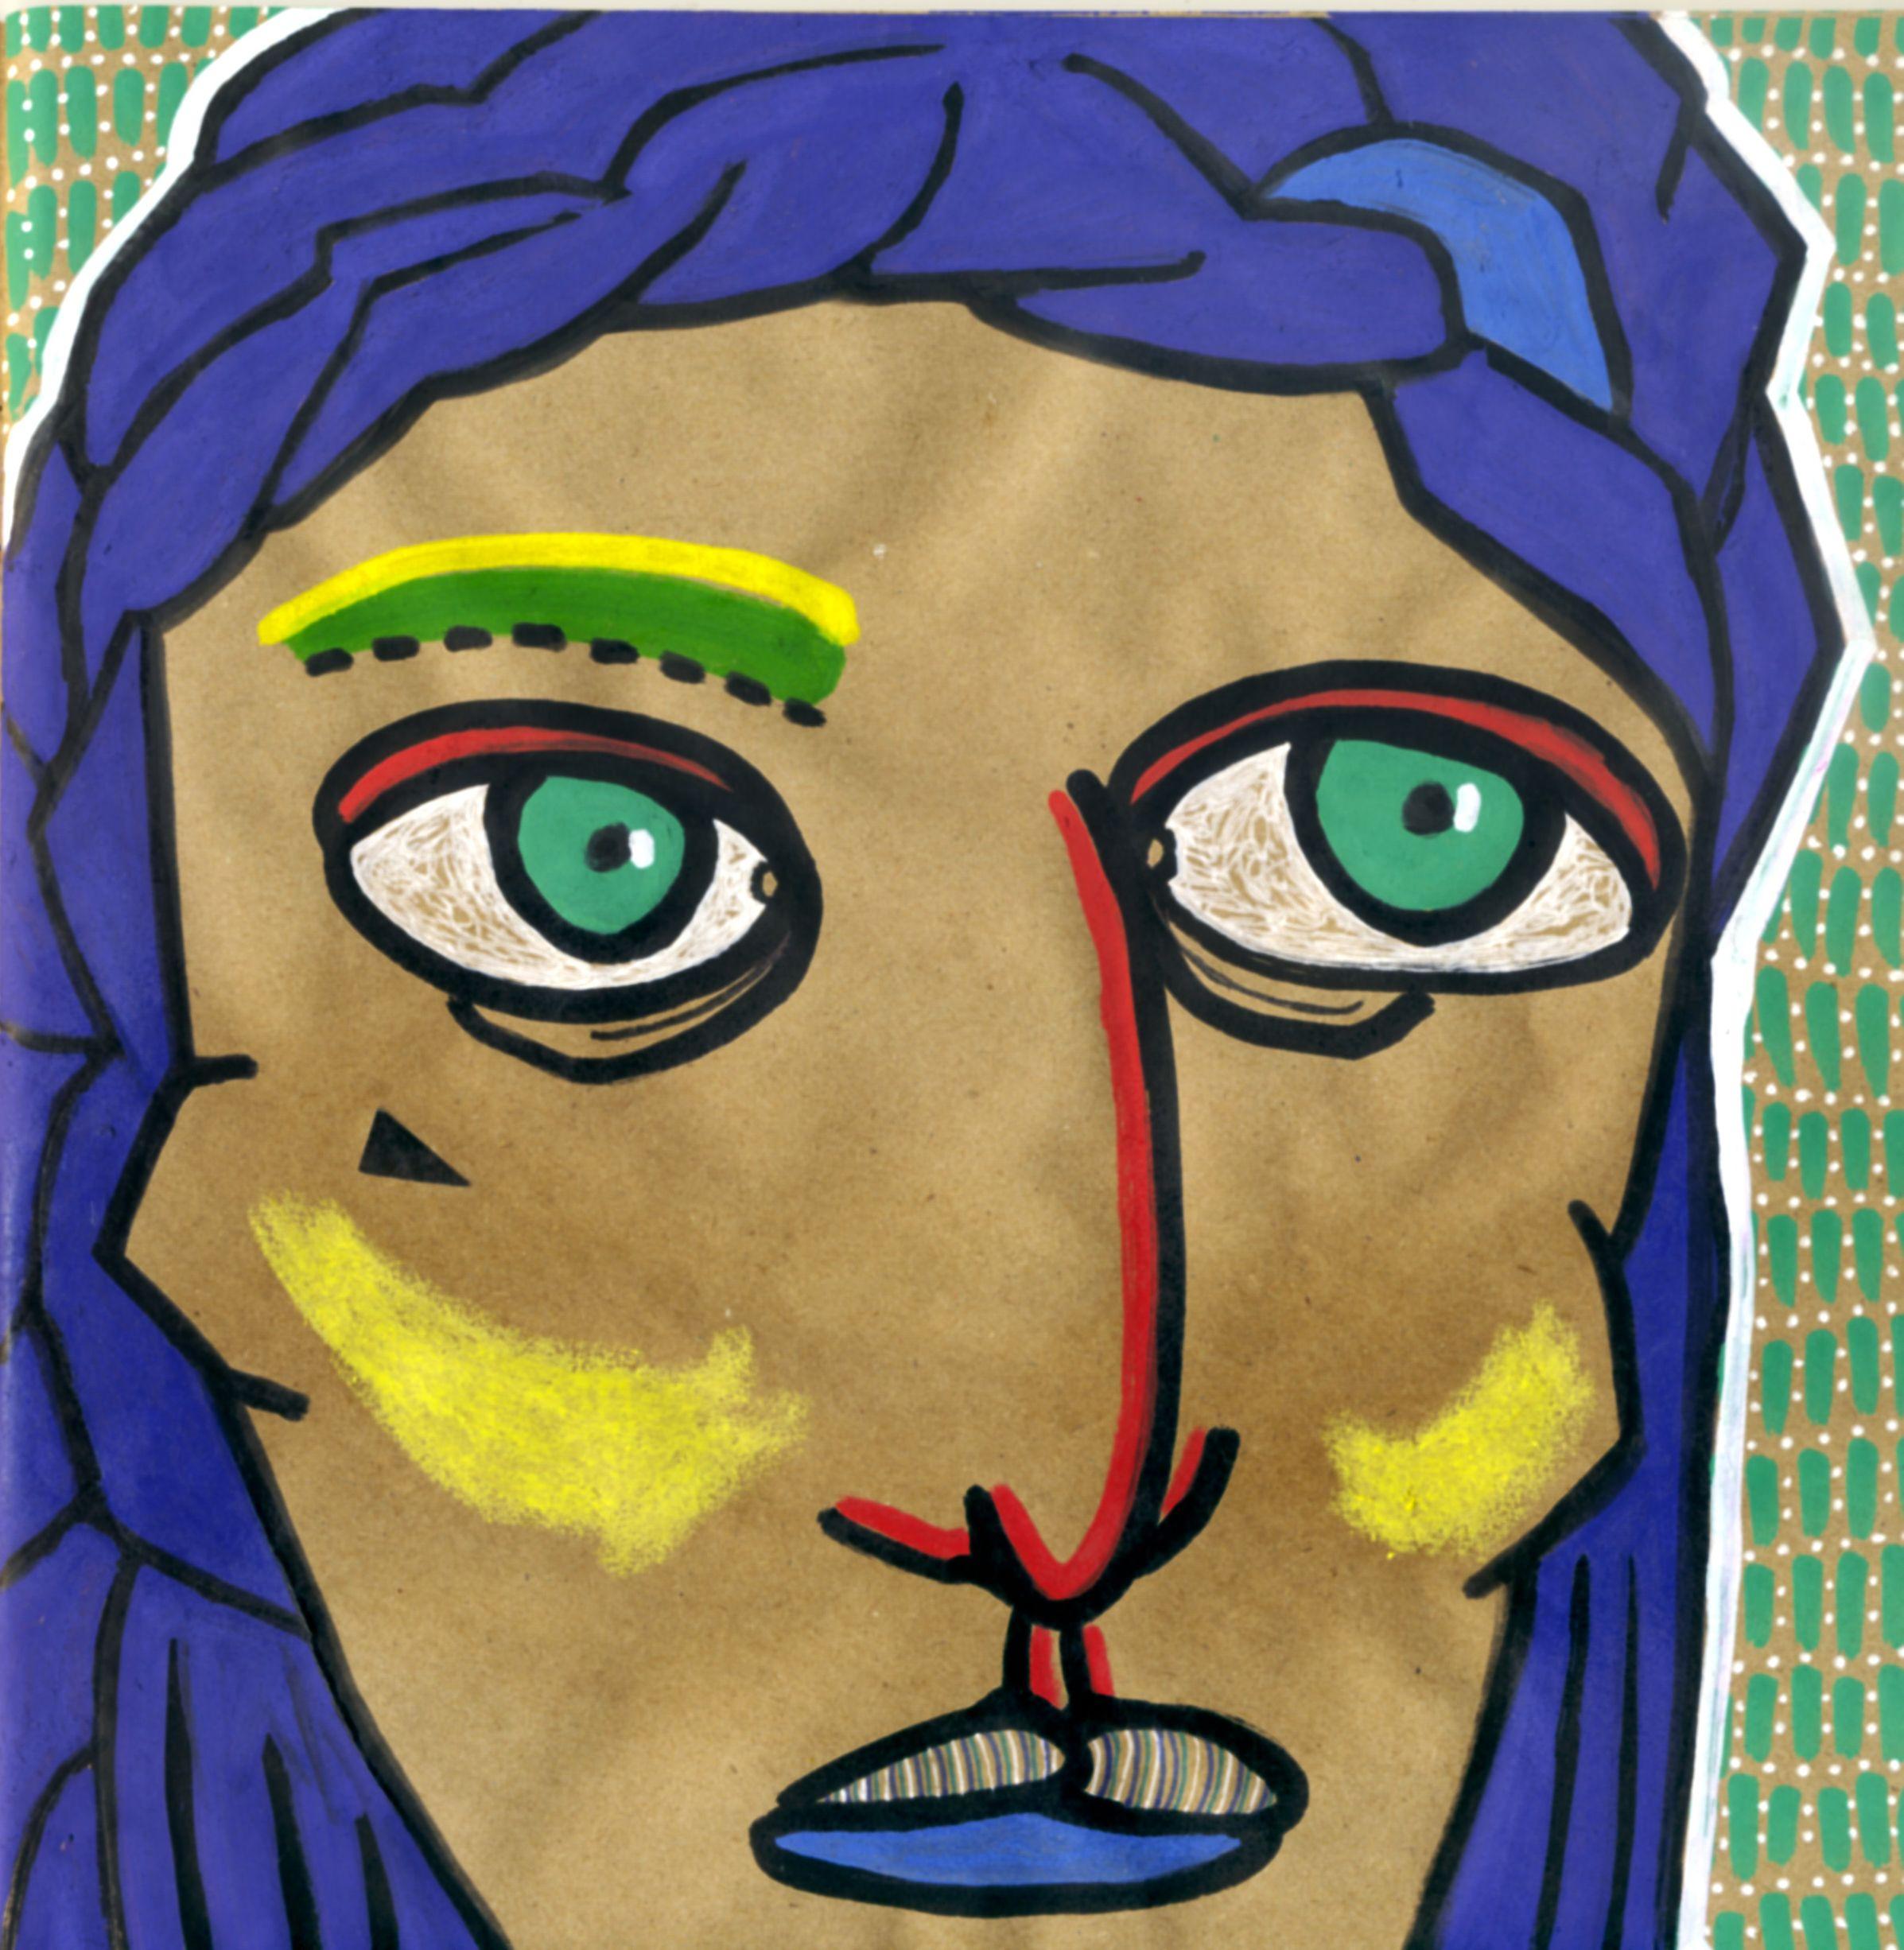 #illustration #katamariart #handdraw #graphics #girl #acrylic #acrylicmarkers #montana #montanamarkers #anyakatamari